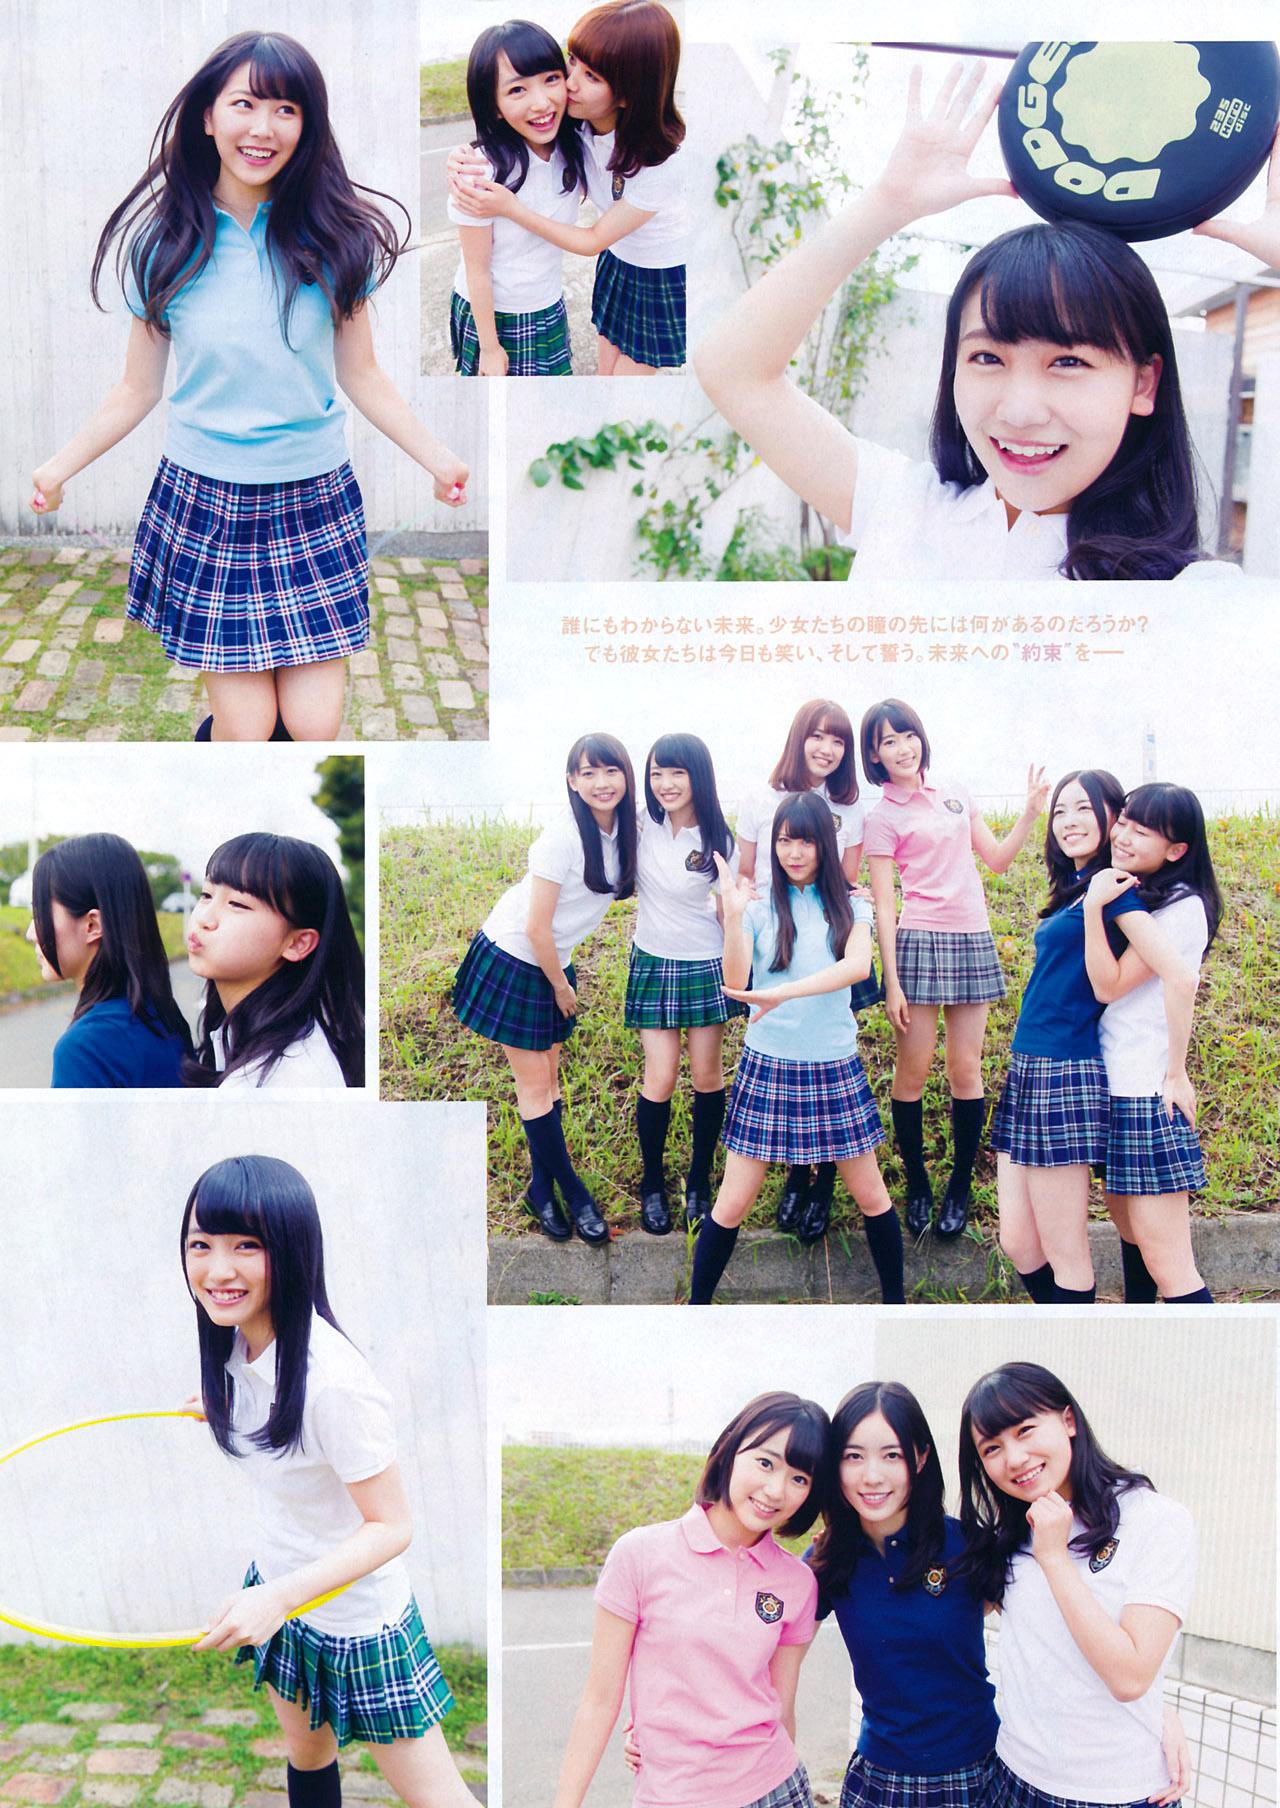 AKB48 WPB 141210 08.jpg